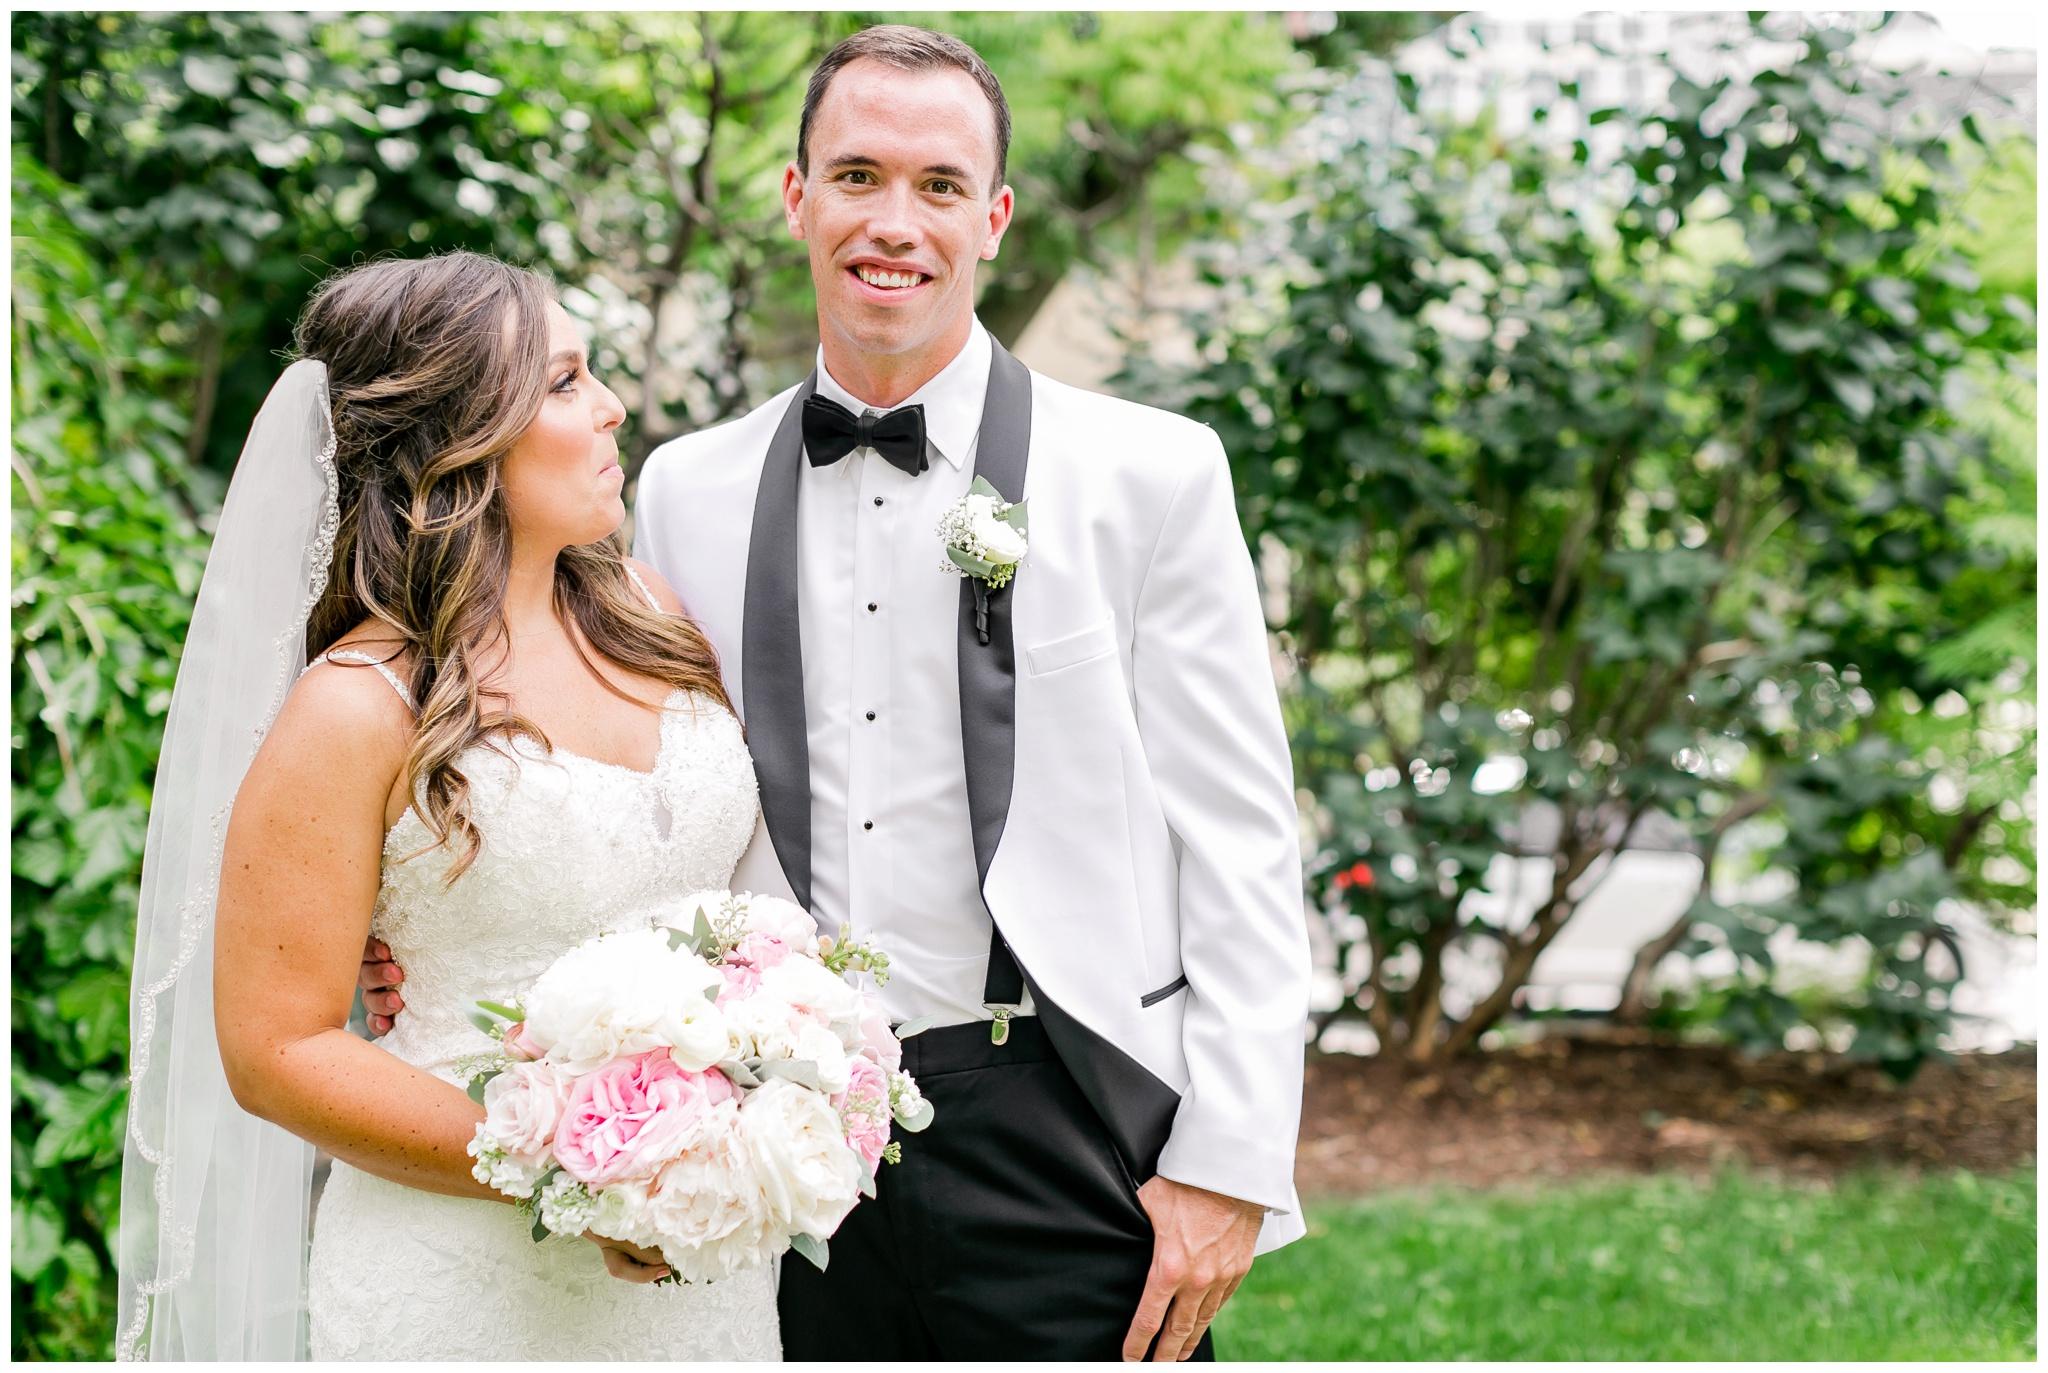 UW_Memorial_Union_wedding_madison_wisconsin_wedding_photographers_4594.jpg